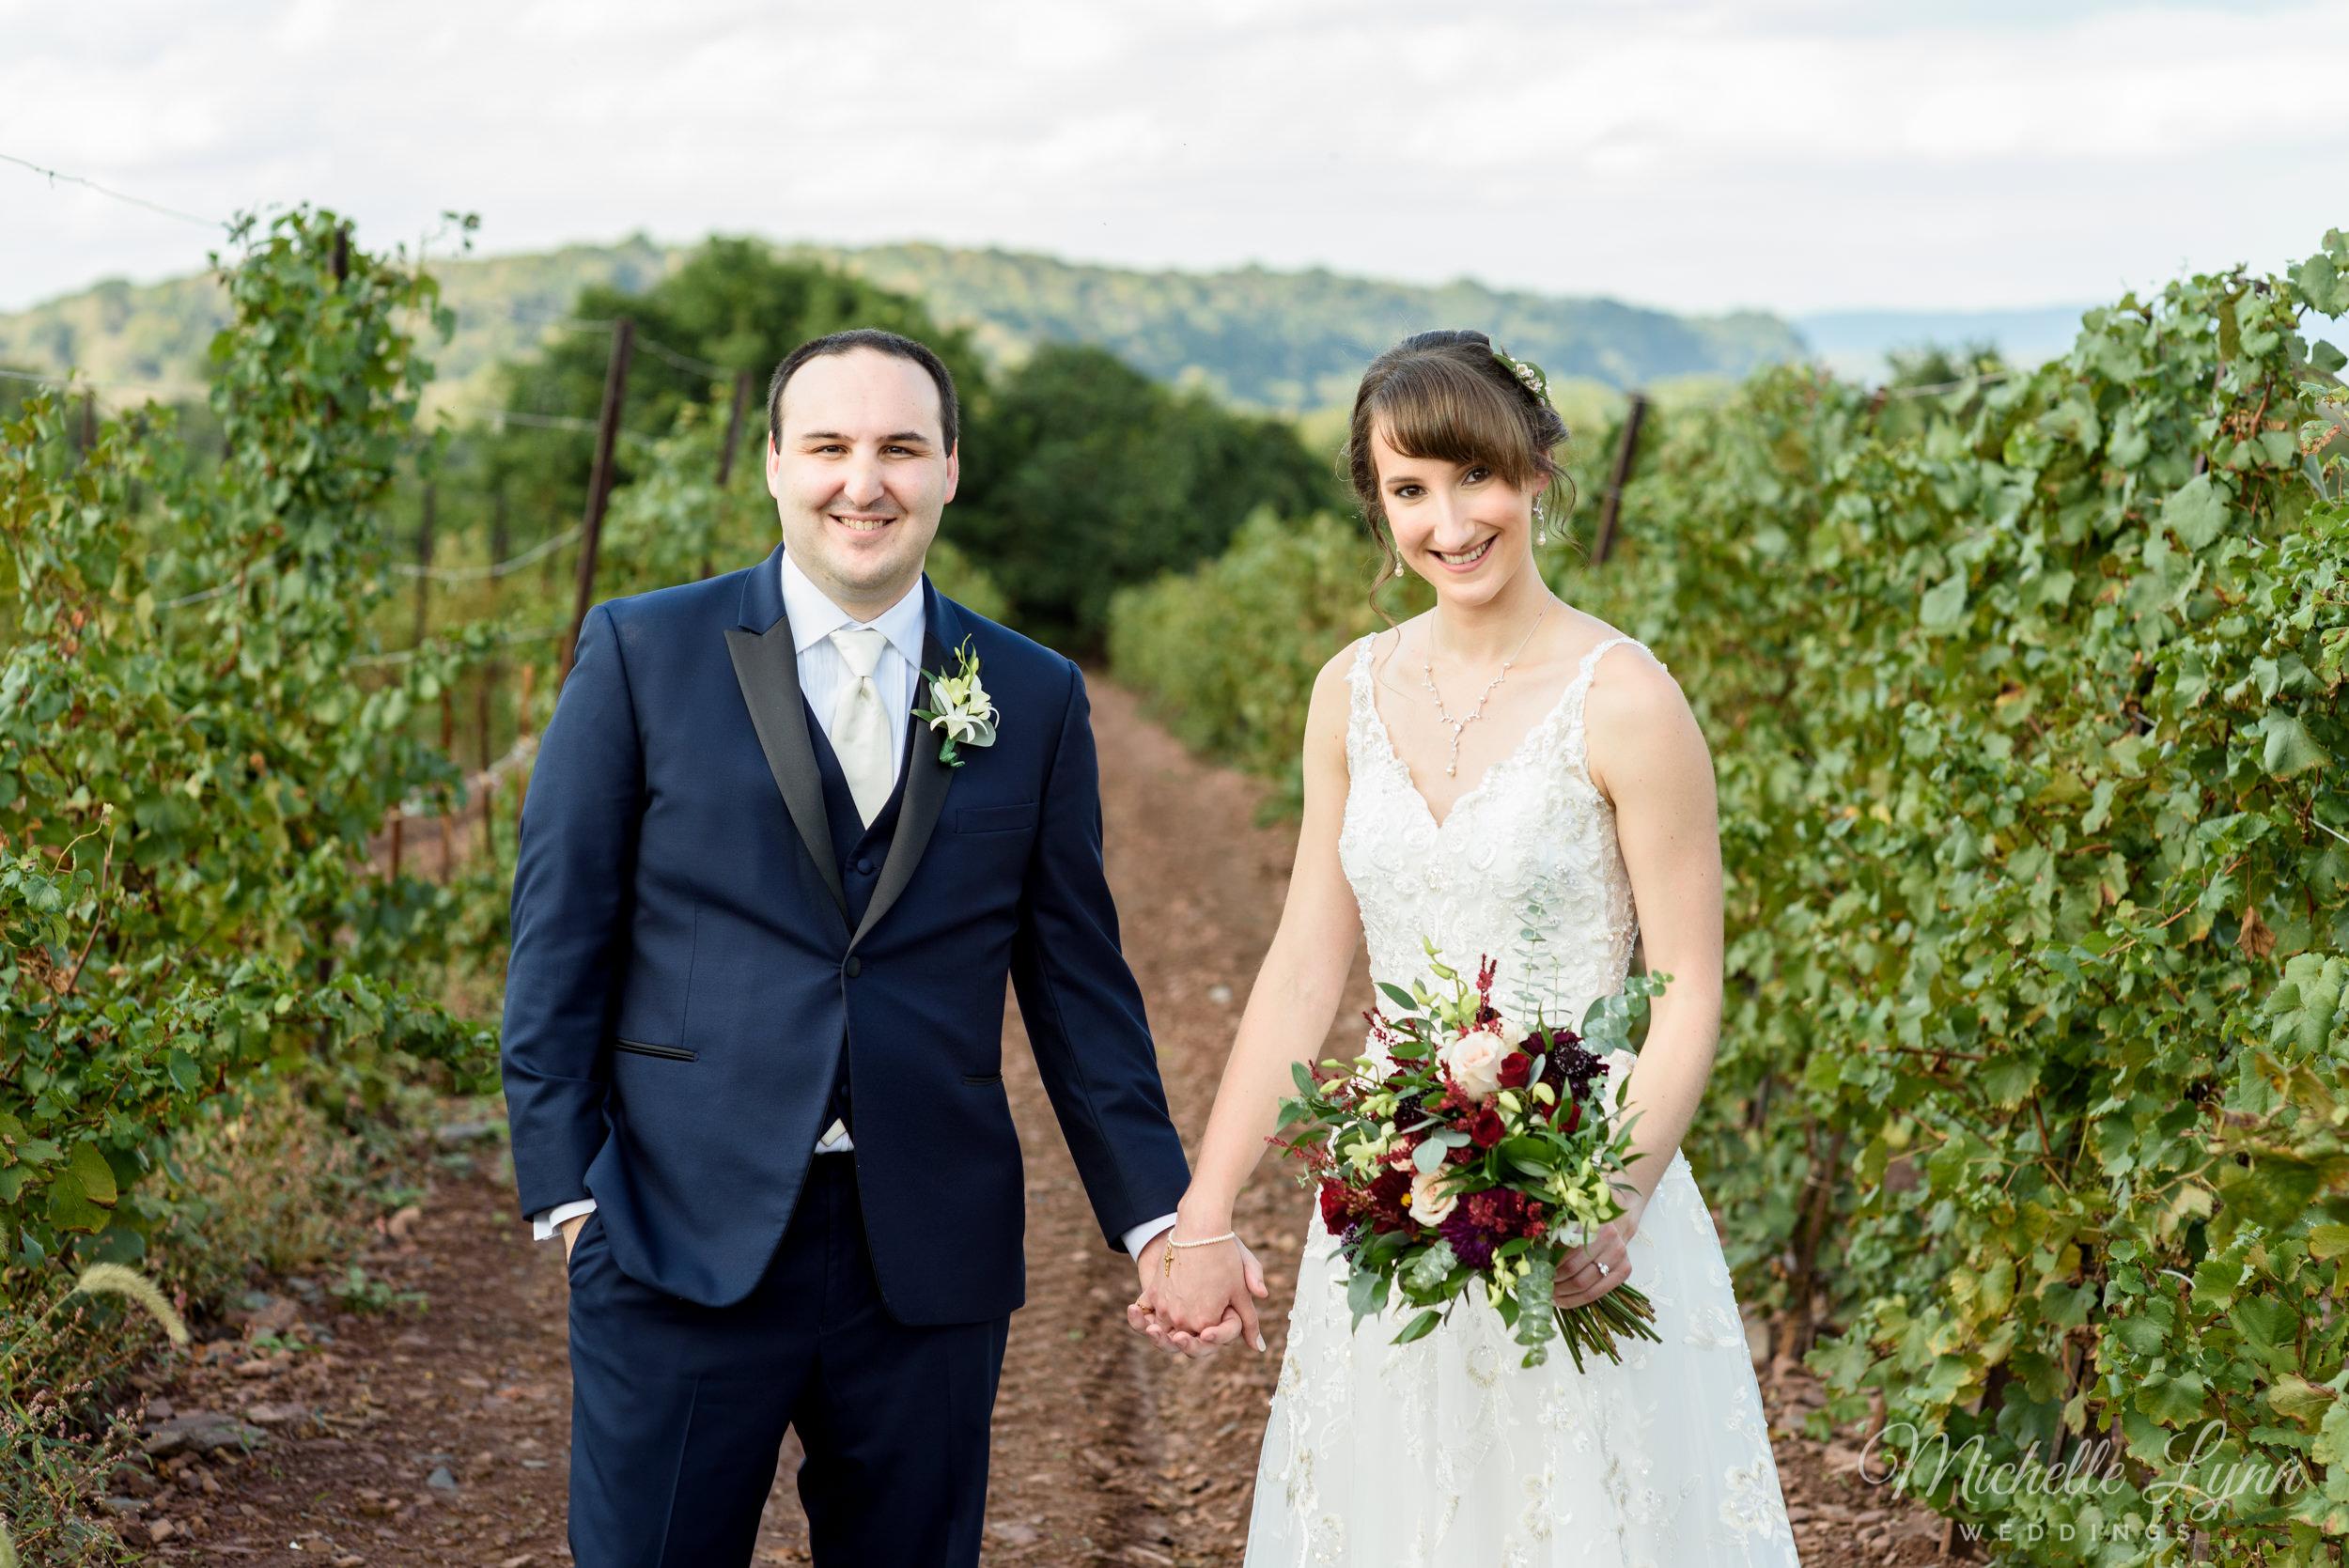 sand-castle-winery-pennsylvania-wedding-photography-48.jpg